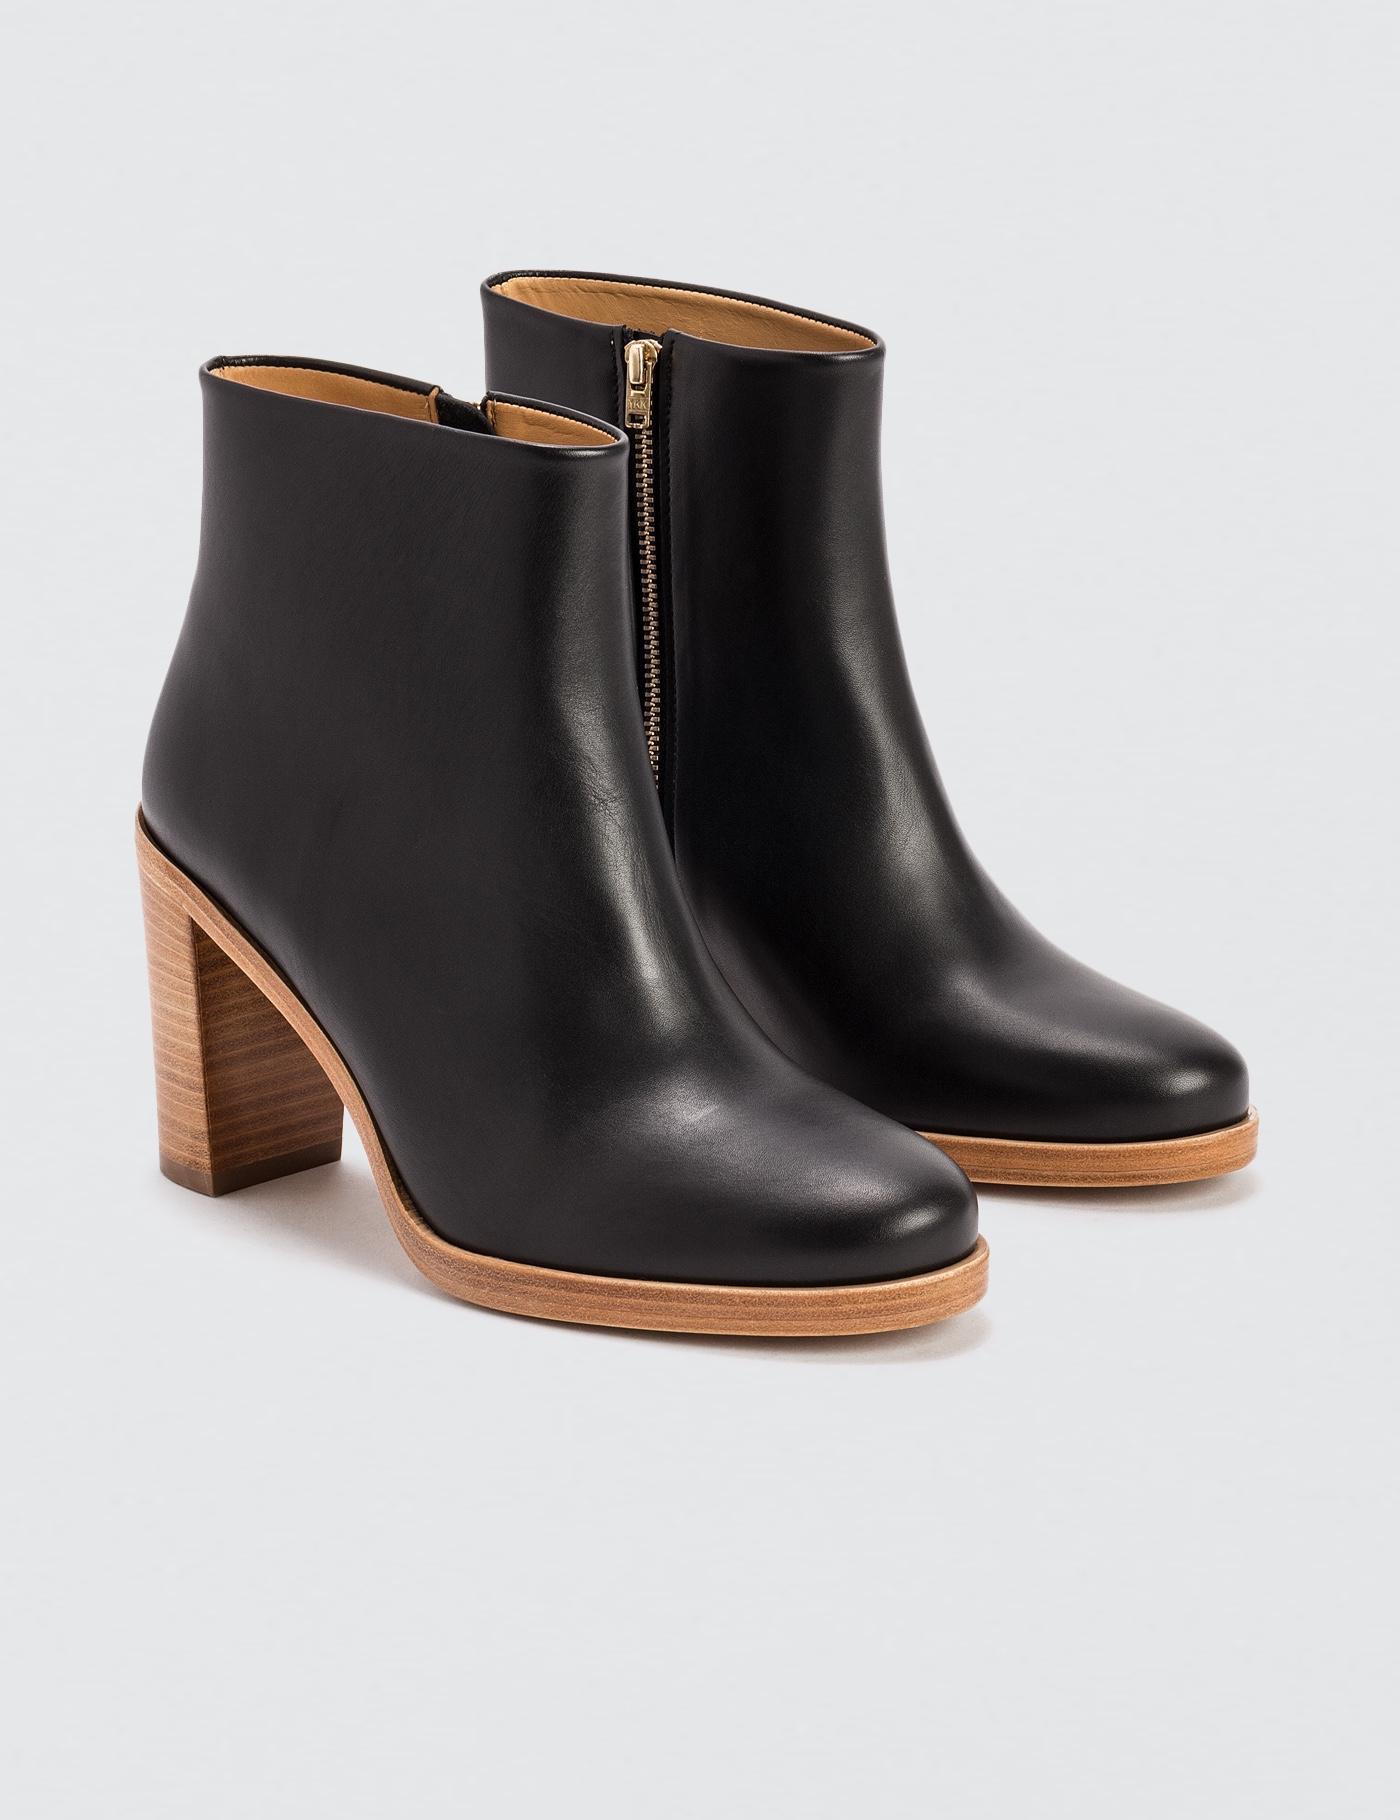 Apc Shoes Australia